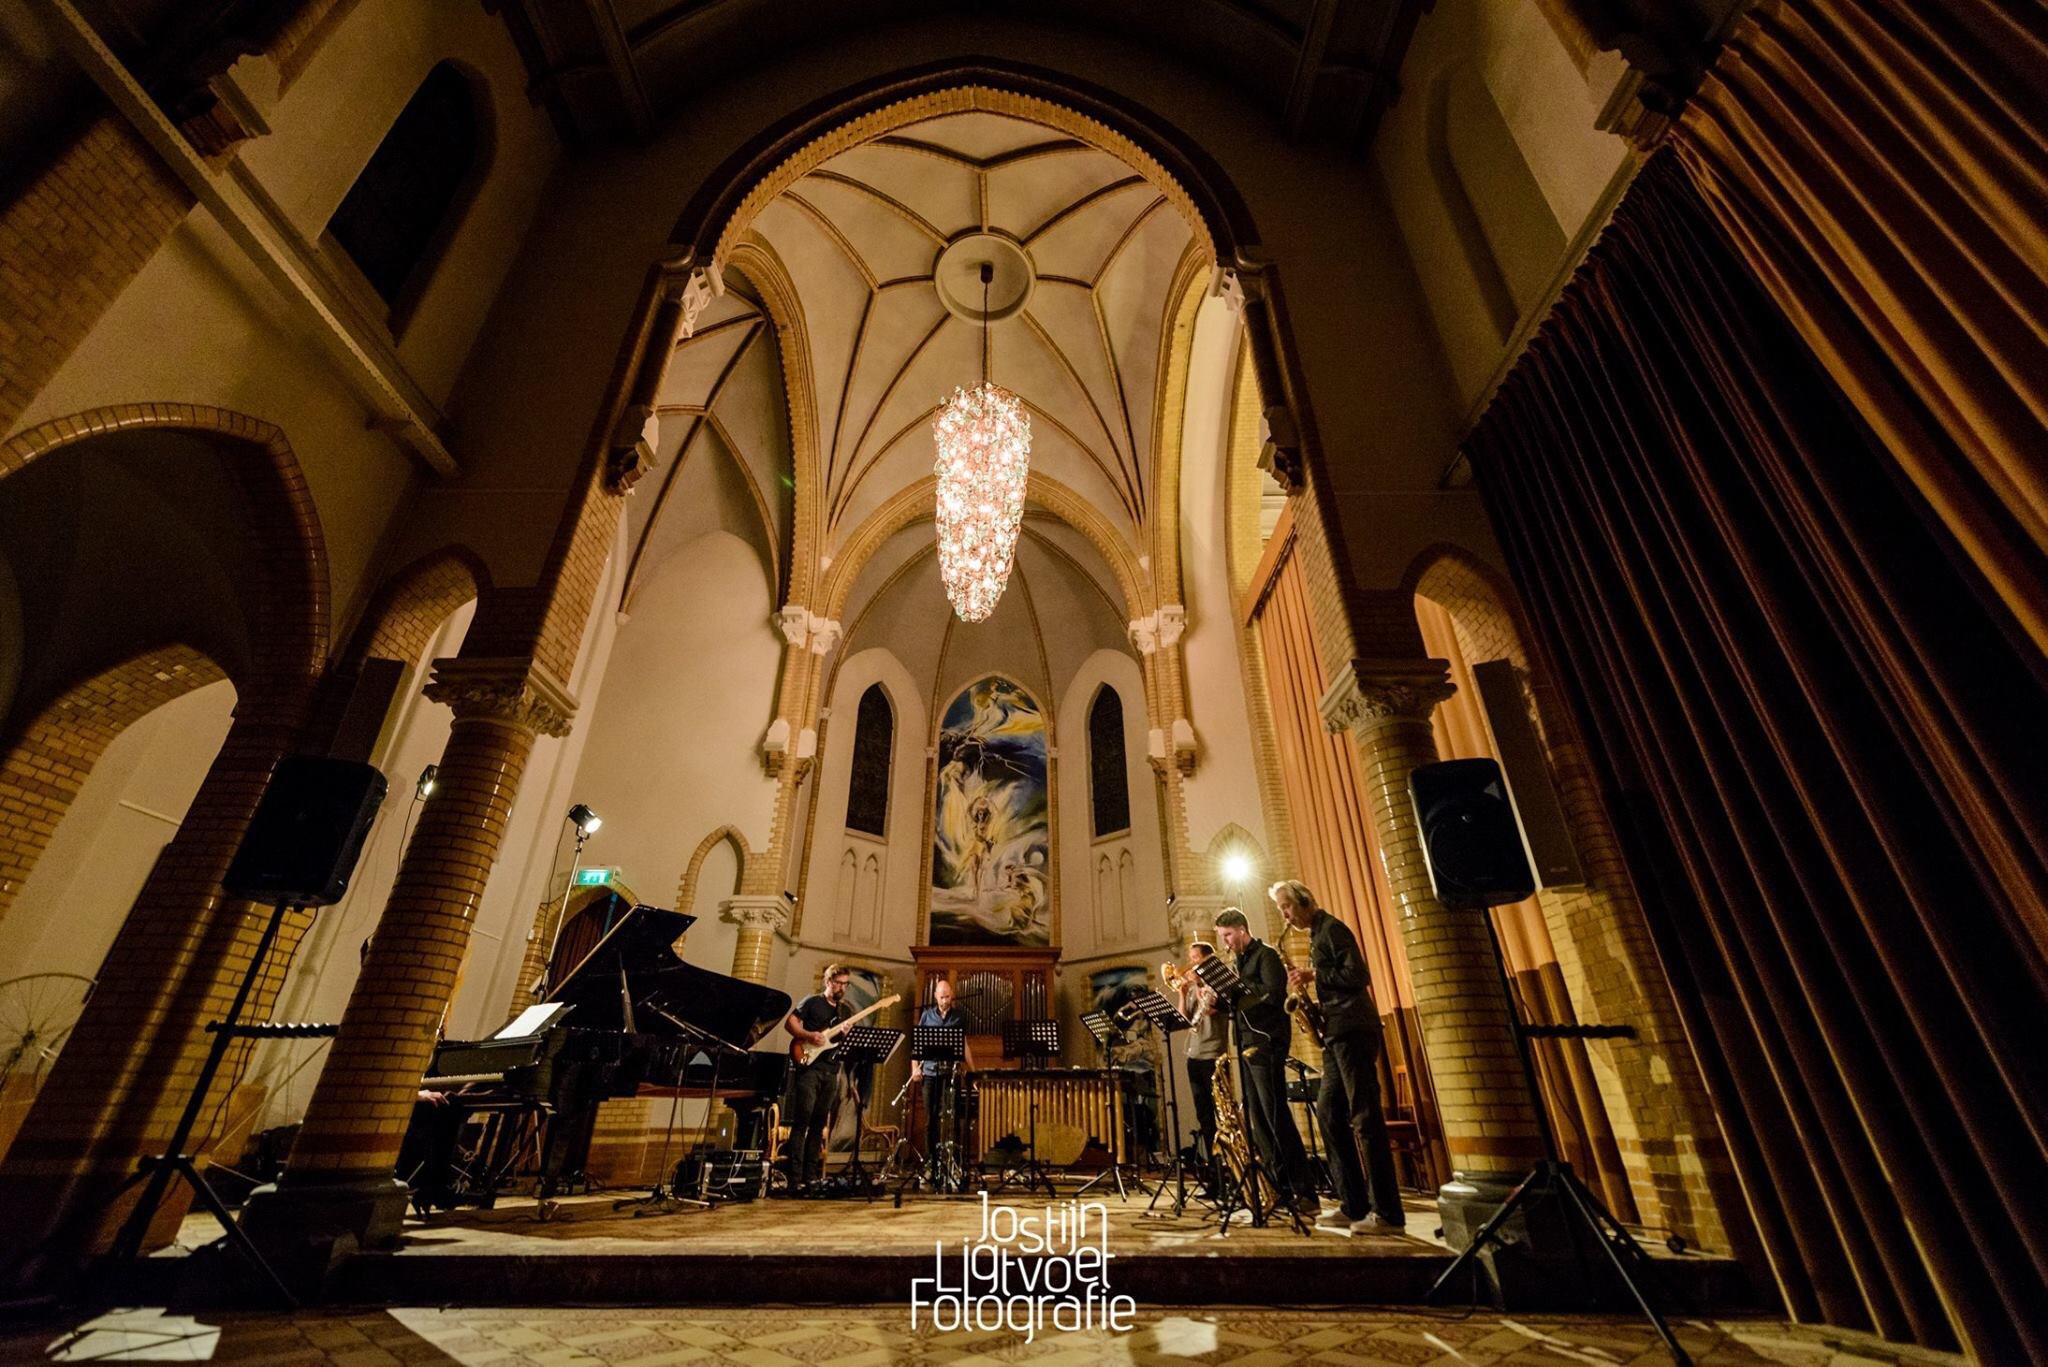 Ensemble Klang by Jostijn Ligtvoet Fotografie